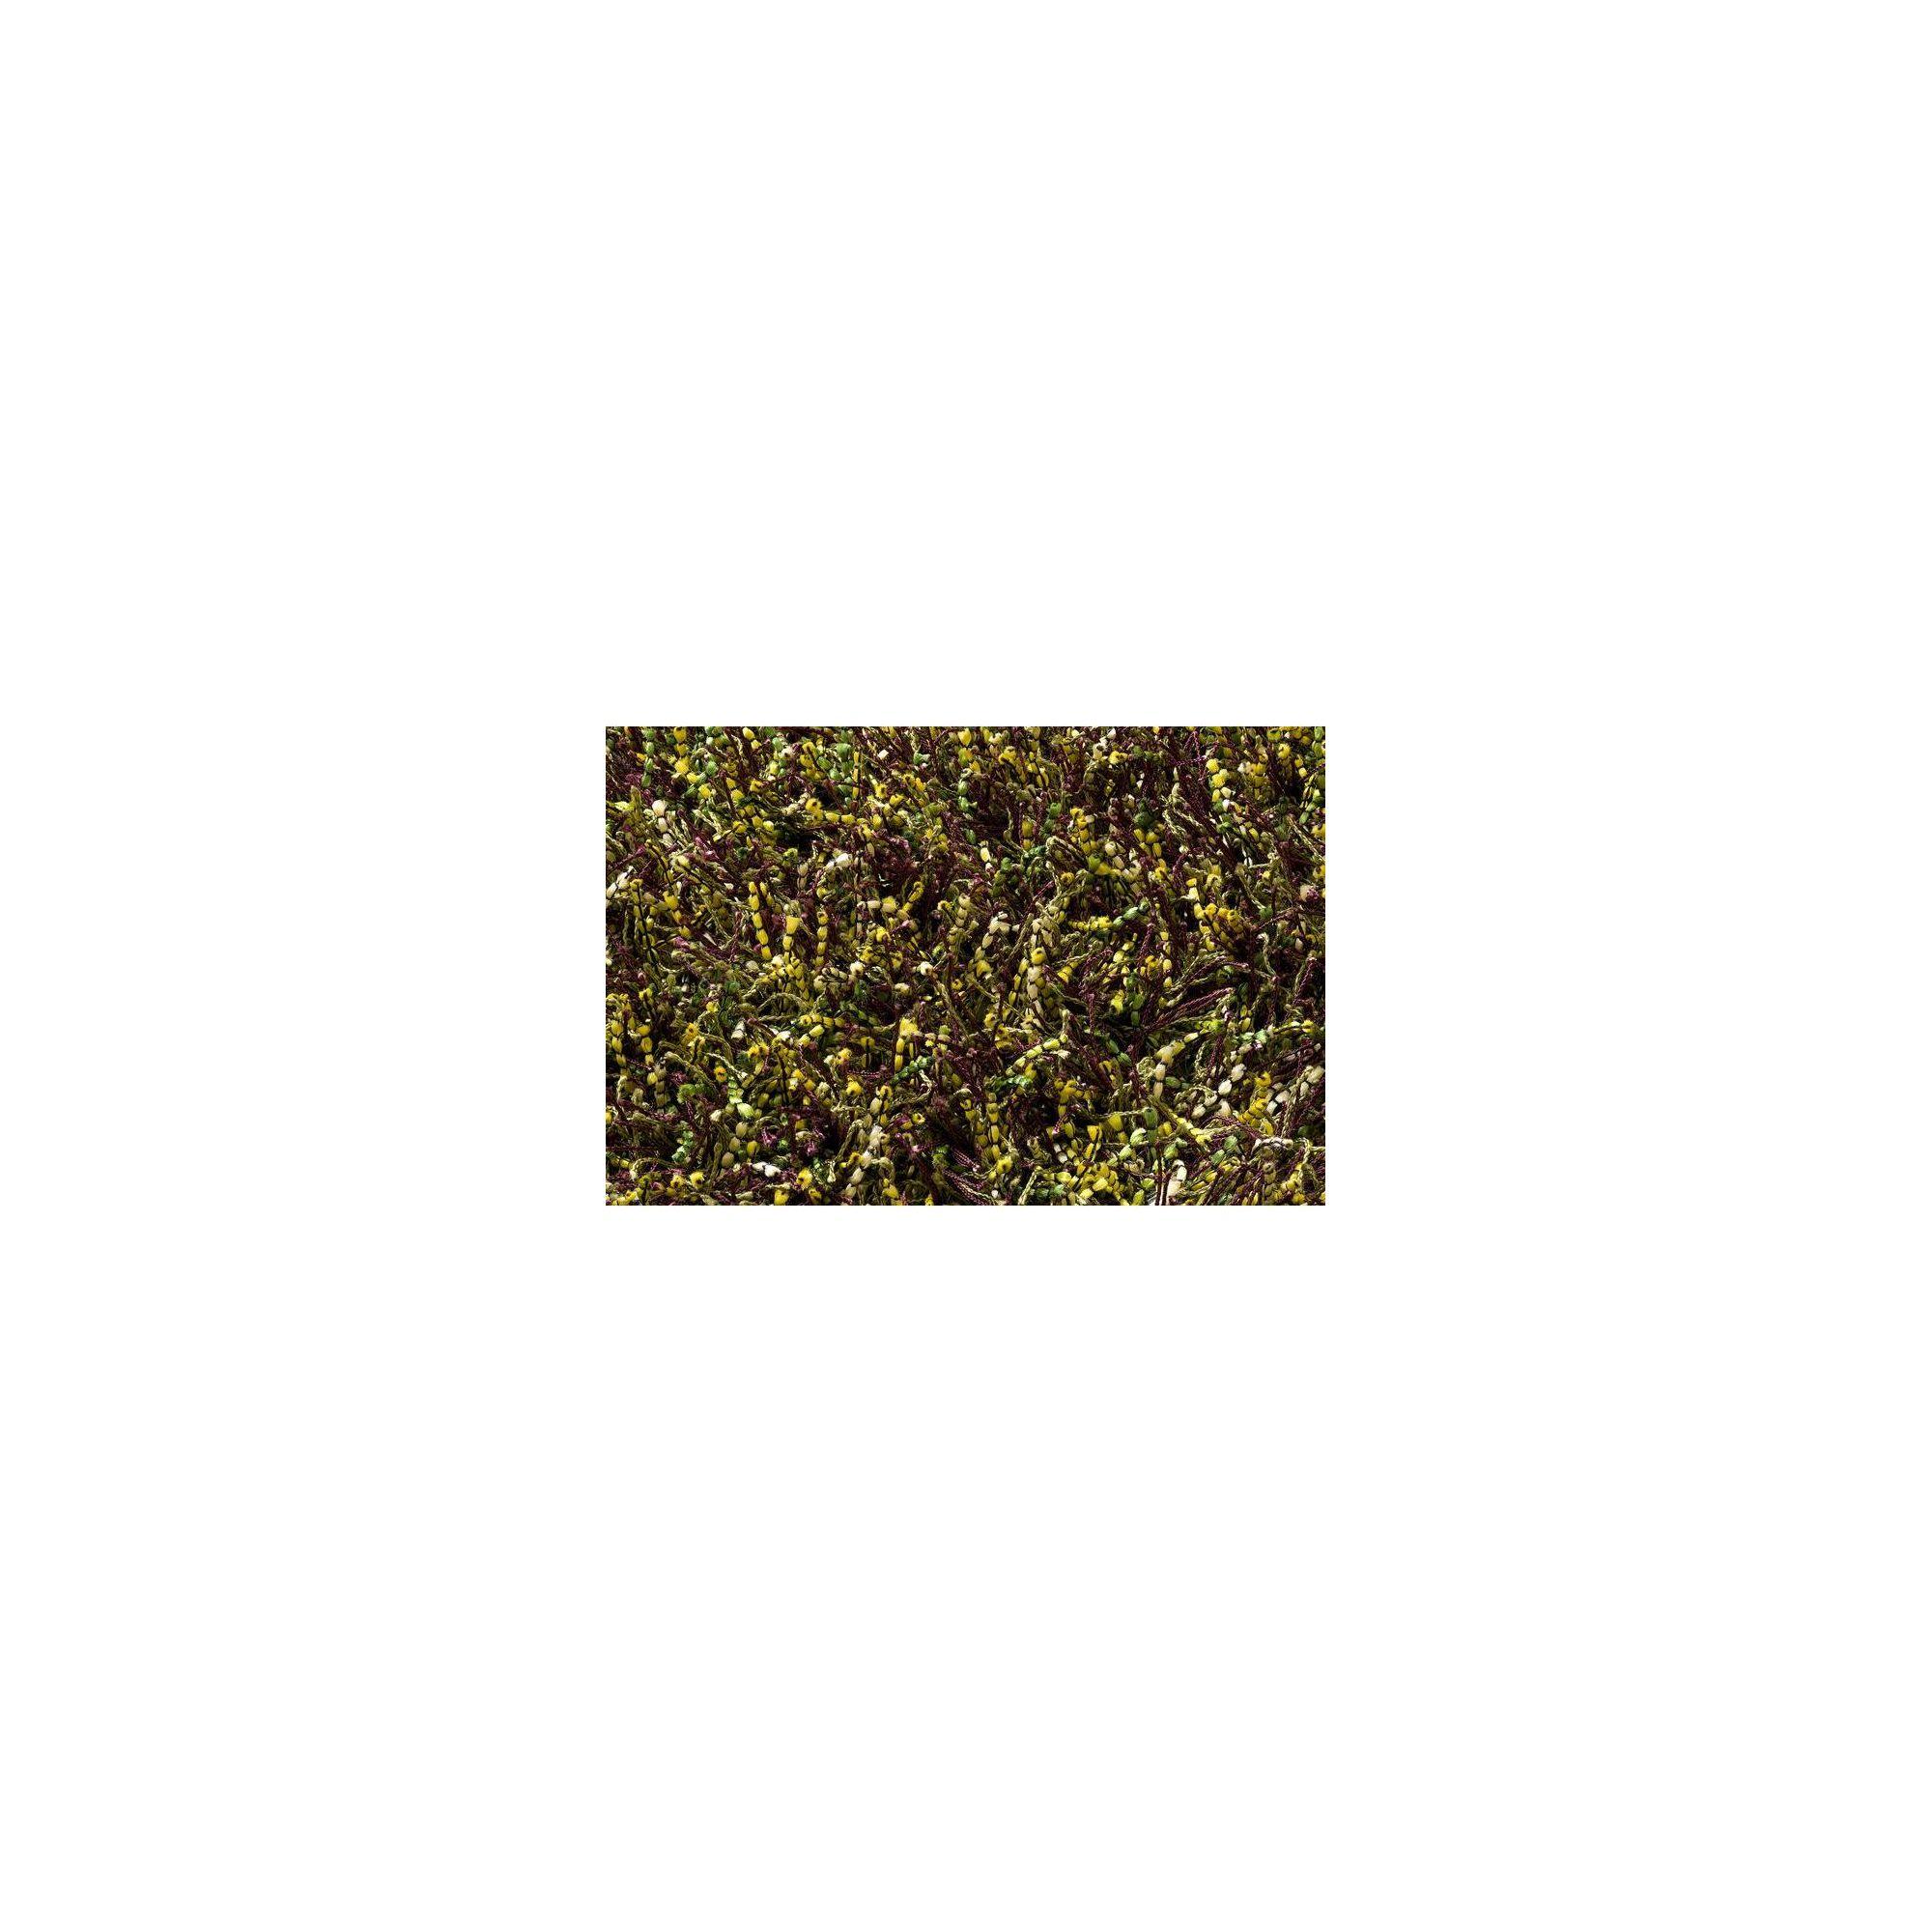 Linie Design Sprinkle Lime Shag Rug - 230cm x 160cm at Tesco Direct